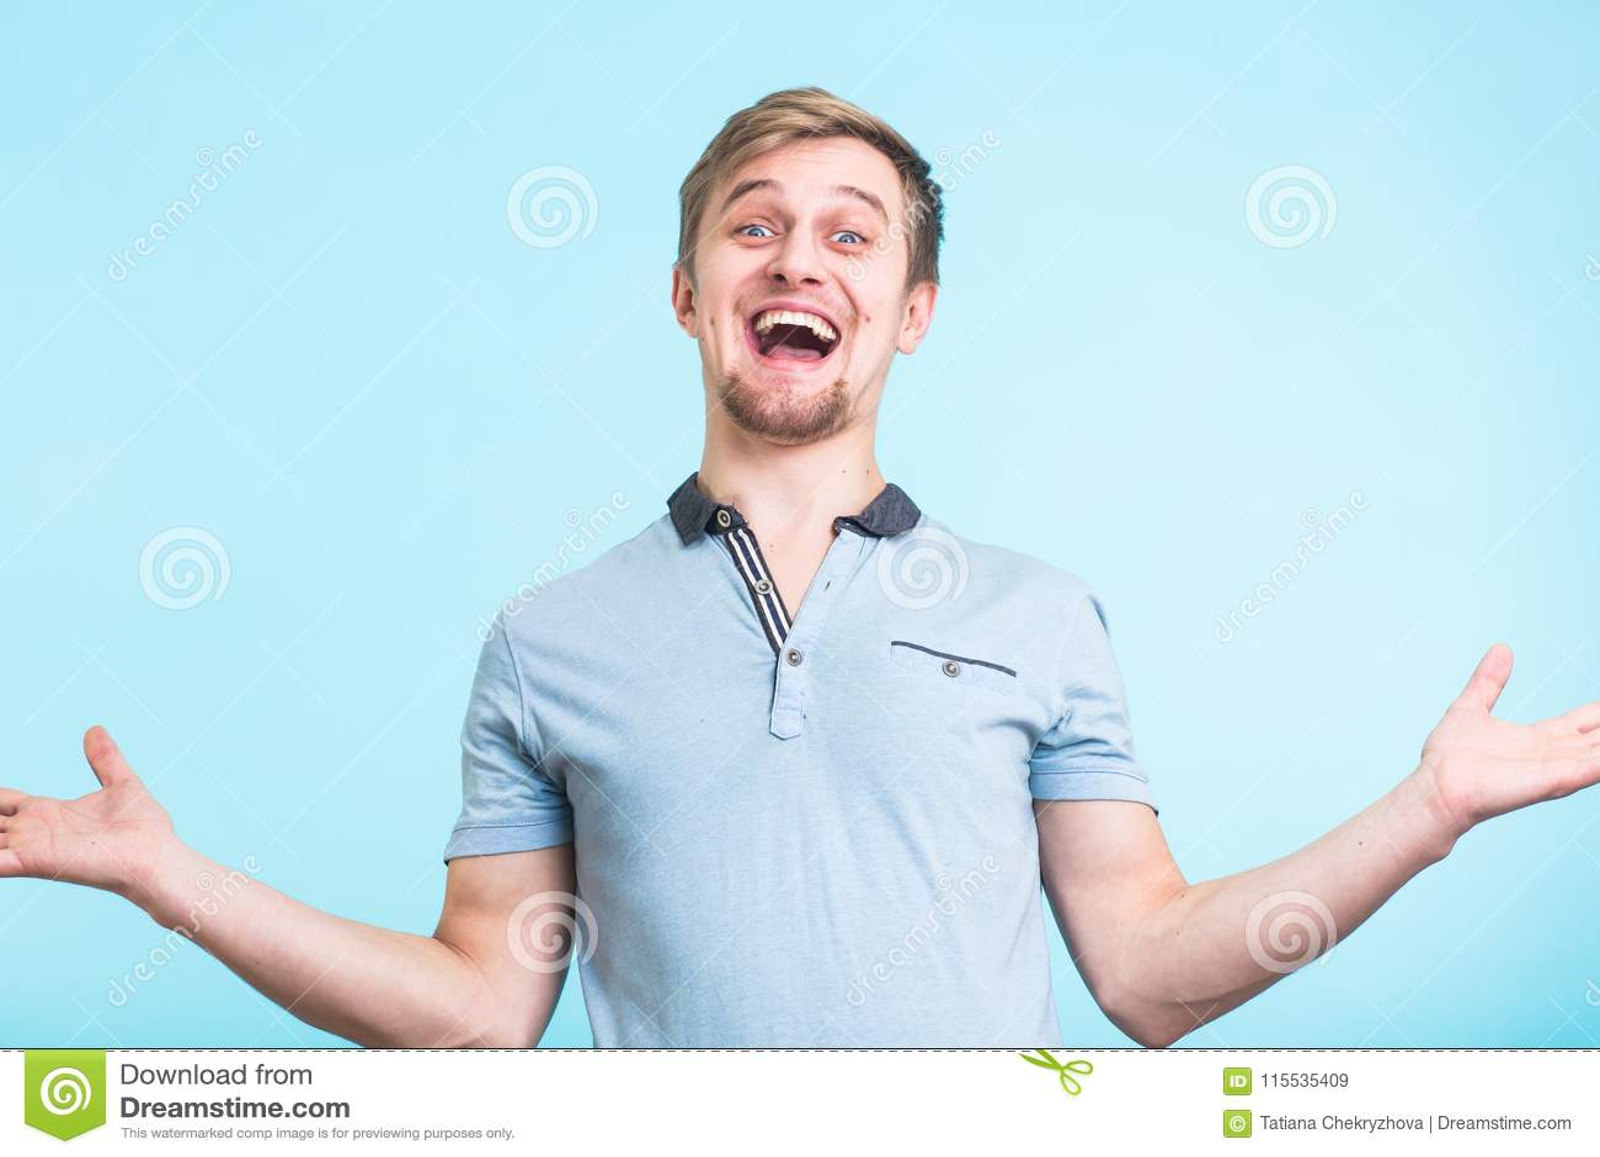 Den upphetsade mannen utropade i lycka, gester aktivt, den uttryckta stora surprisementen, över blå bakgrund